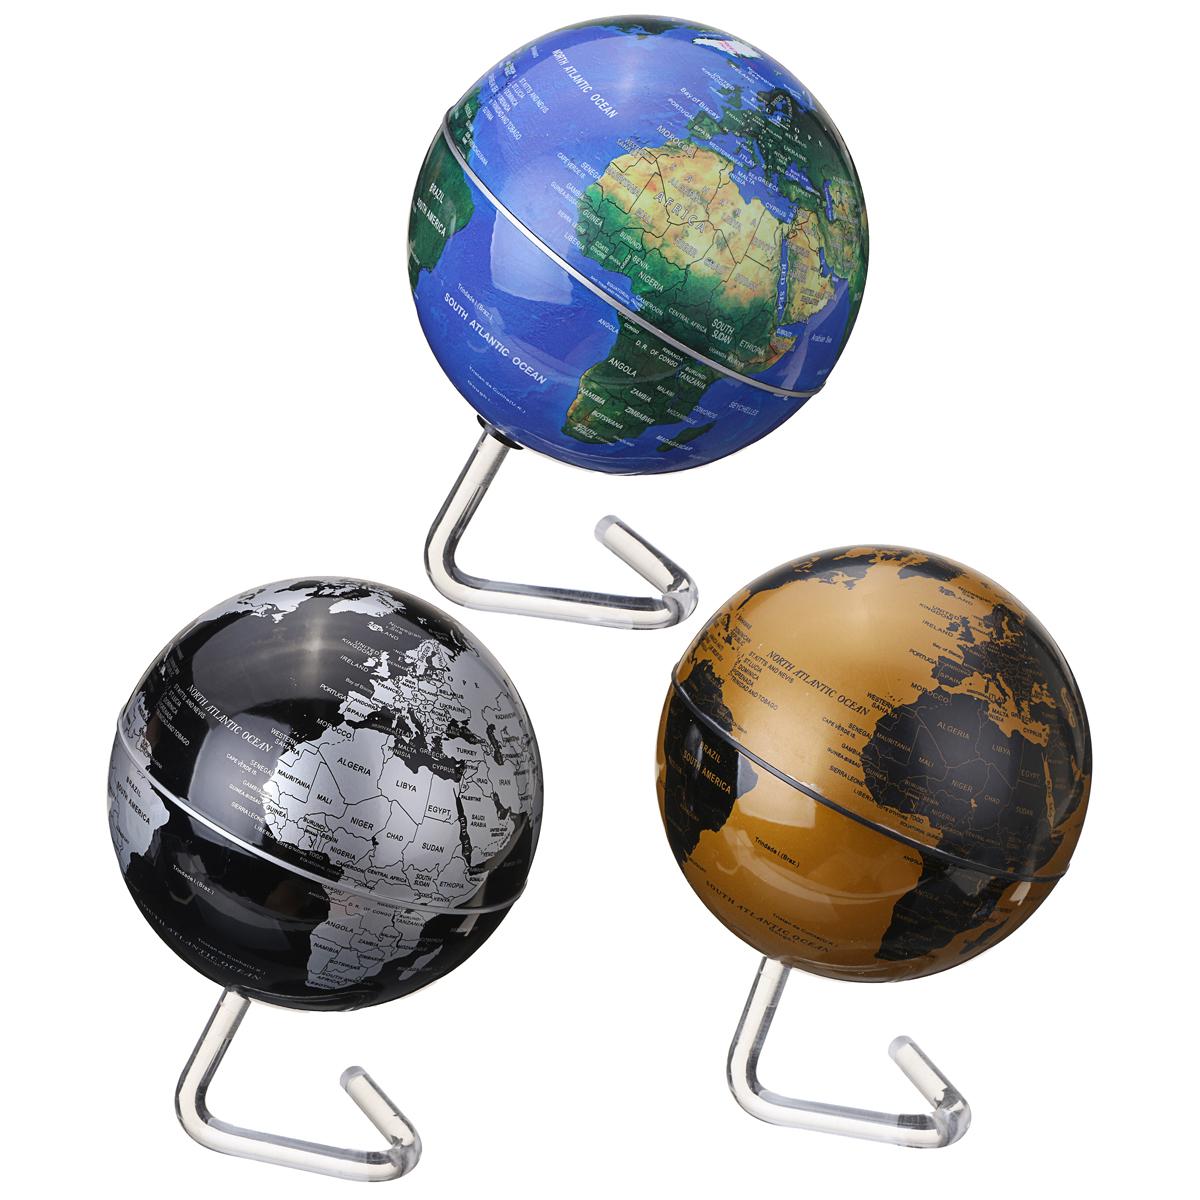 4 Inch Diameter Electric Rotating Globe Automatic 360 Dregee Rotation Desktop World Map